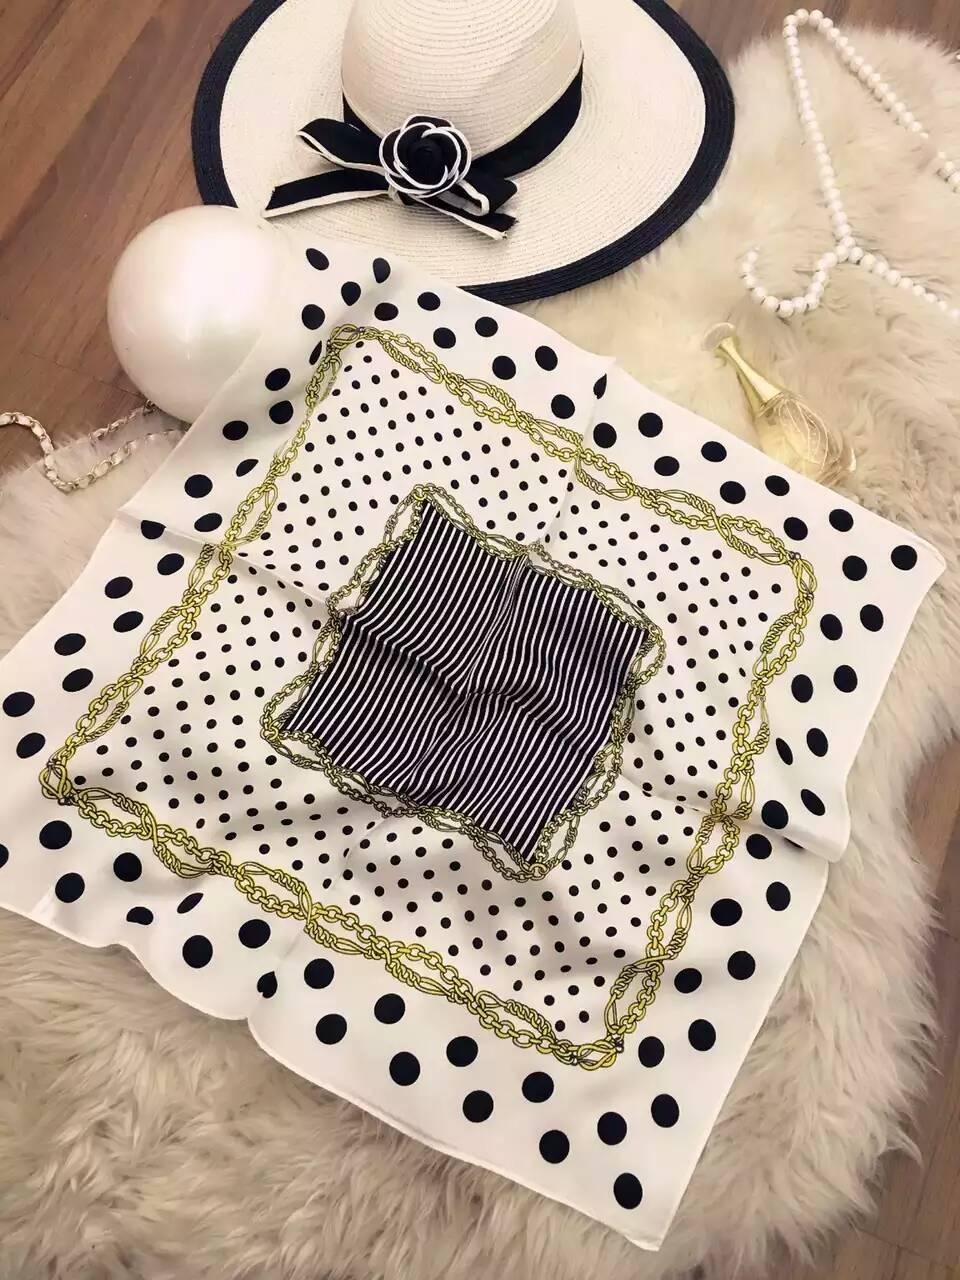 [SLKSCF] 55X55CM Brief Dot Print Silk Scarf Square Classic Design Real Satin Scarves Small Neckerchief Female - SLKSCF Store store